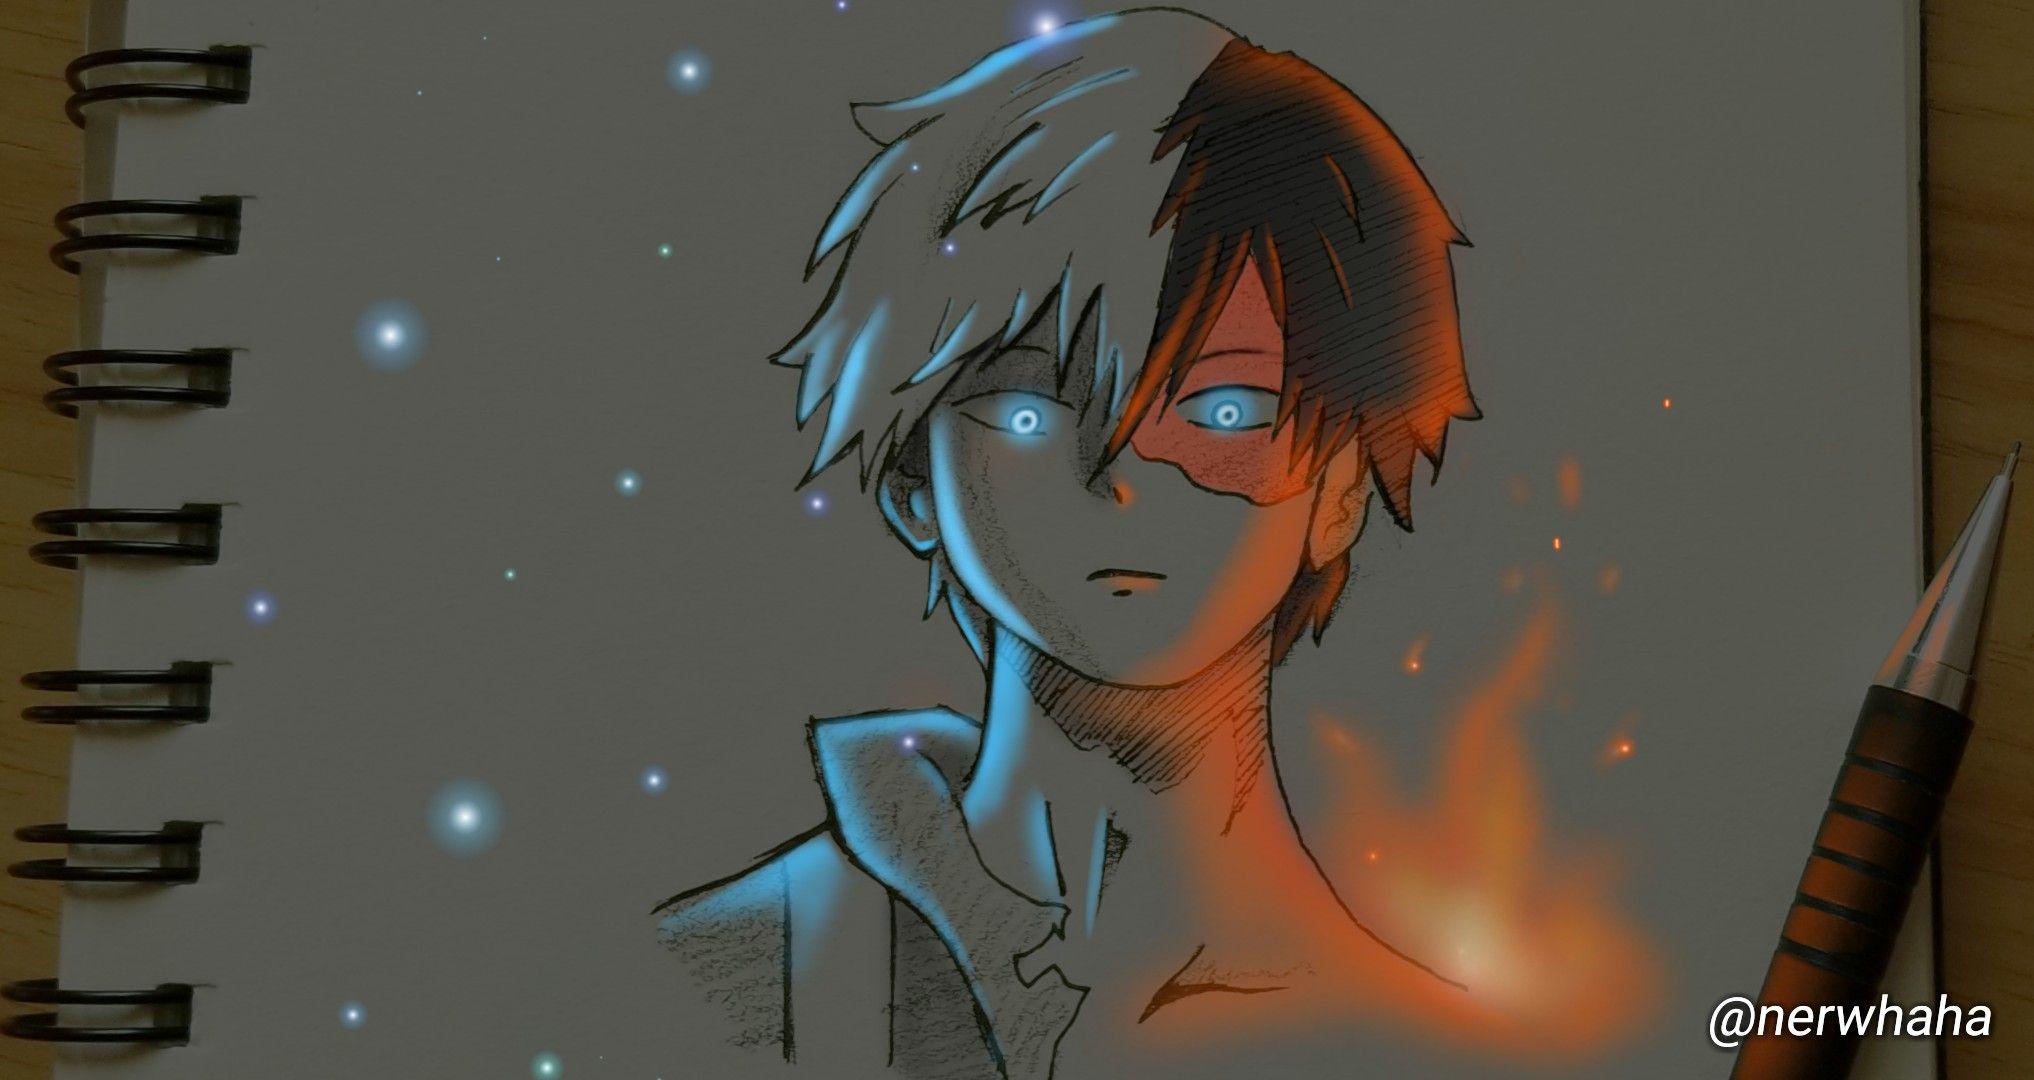 رسم انمي استخدام الوان مضيئة Humanoid Sketch Art Anime